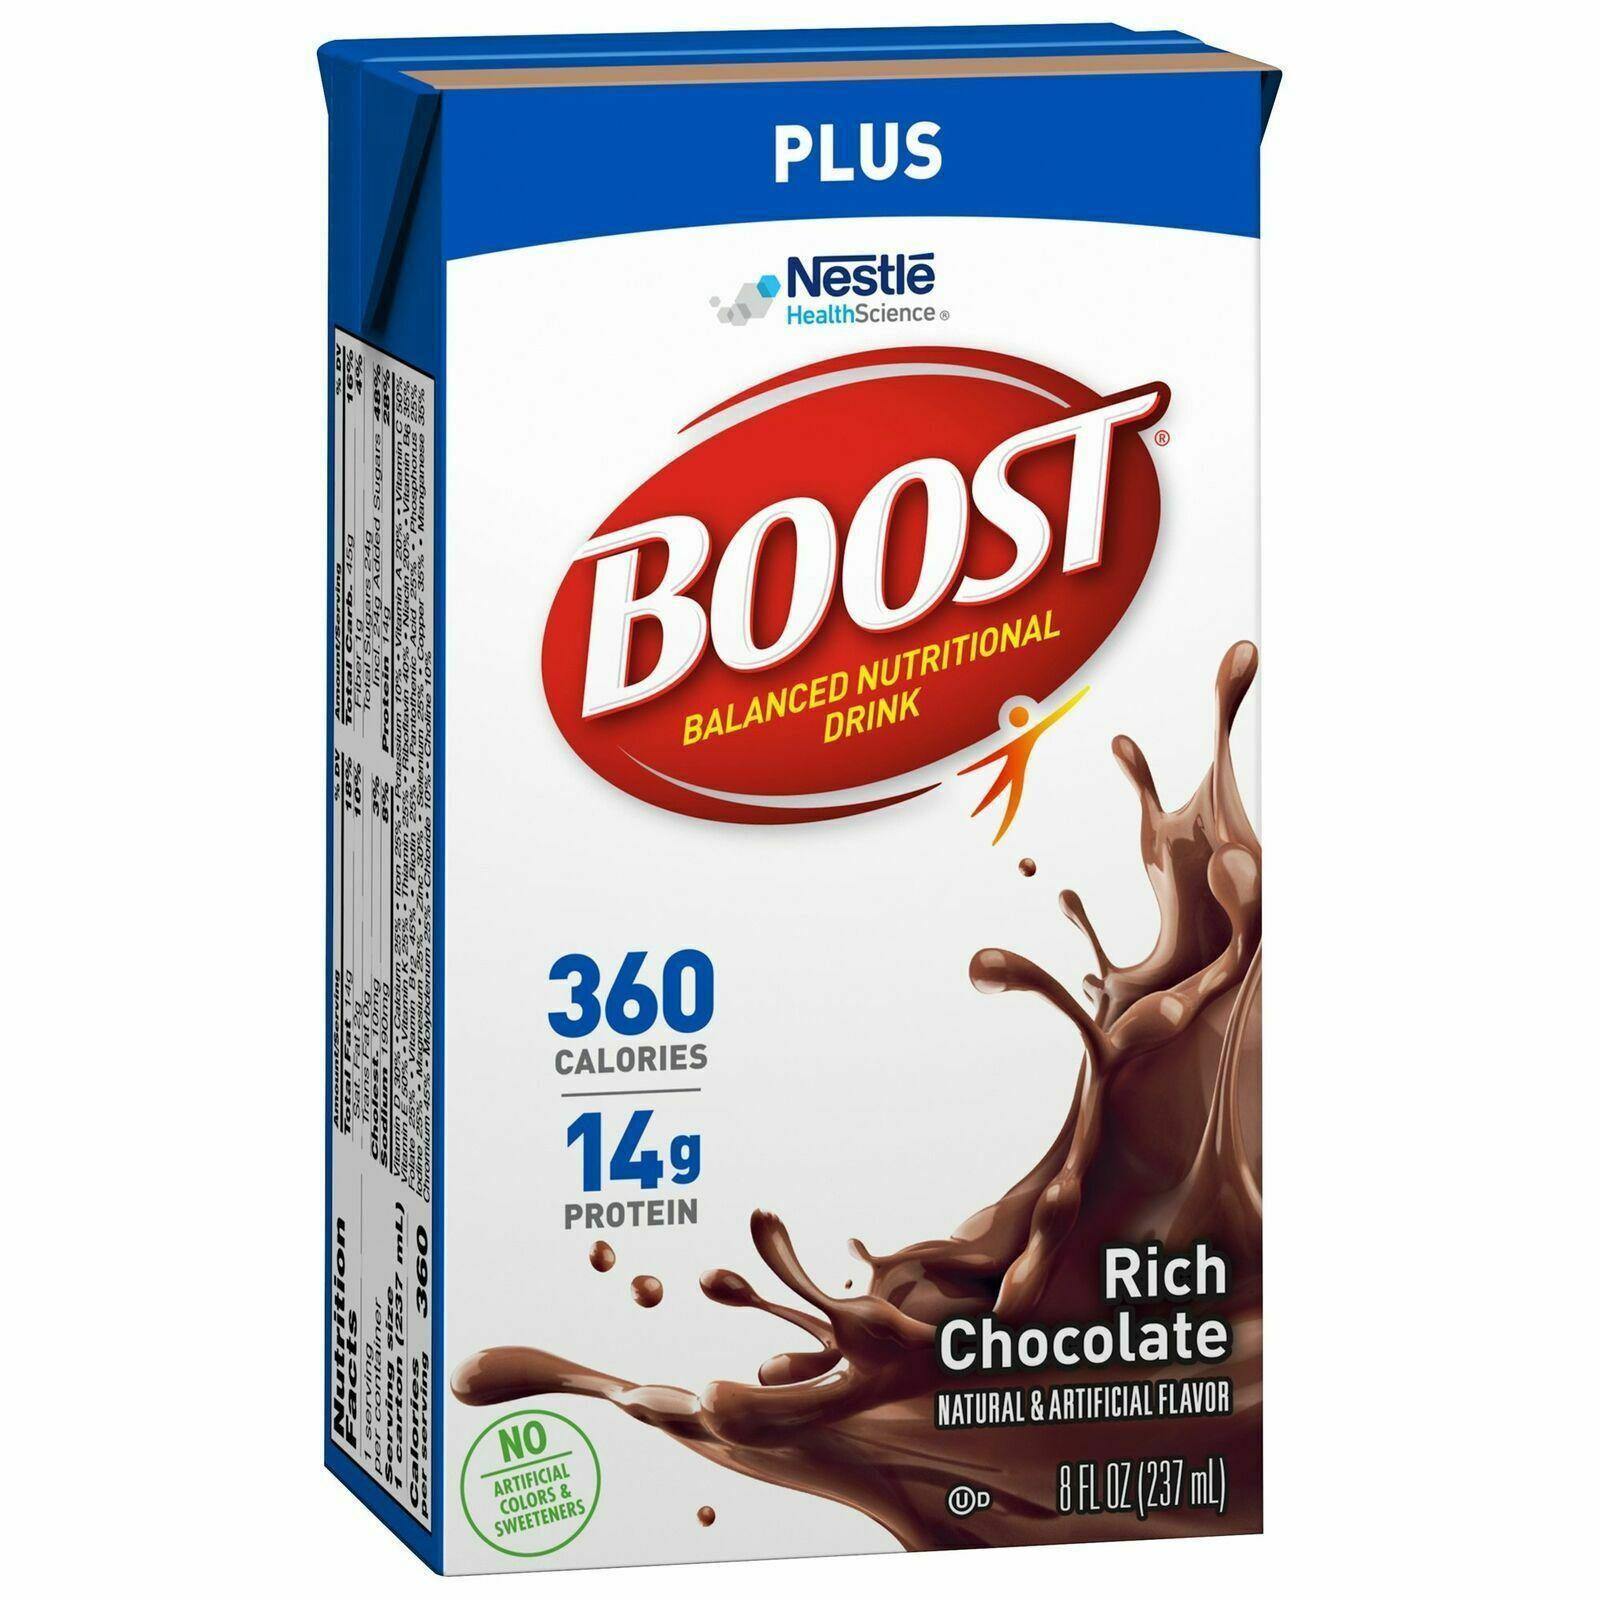 Nestle Boost Plus Oral Supplement, Rich Chocolate, 8 oz Carton, 27 Ct - $69.05